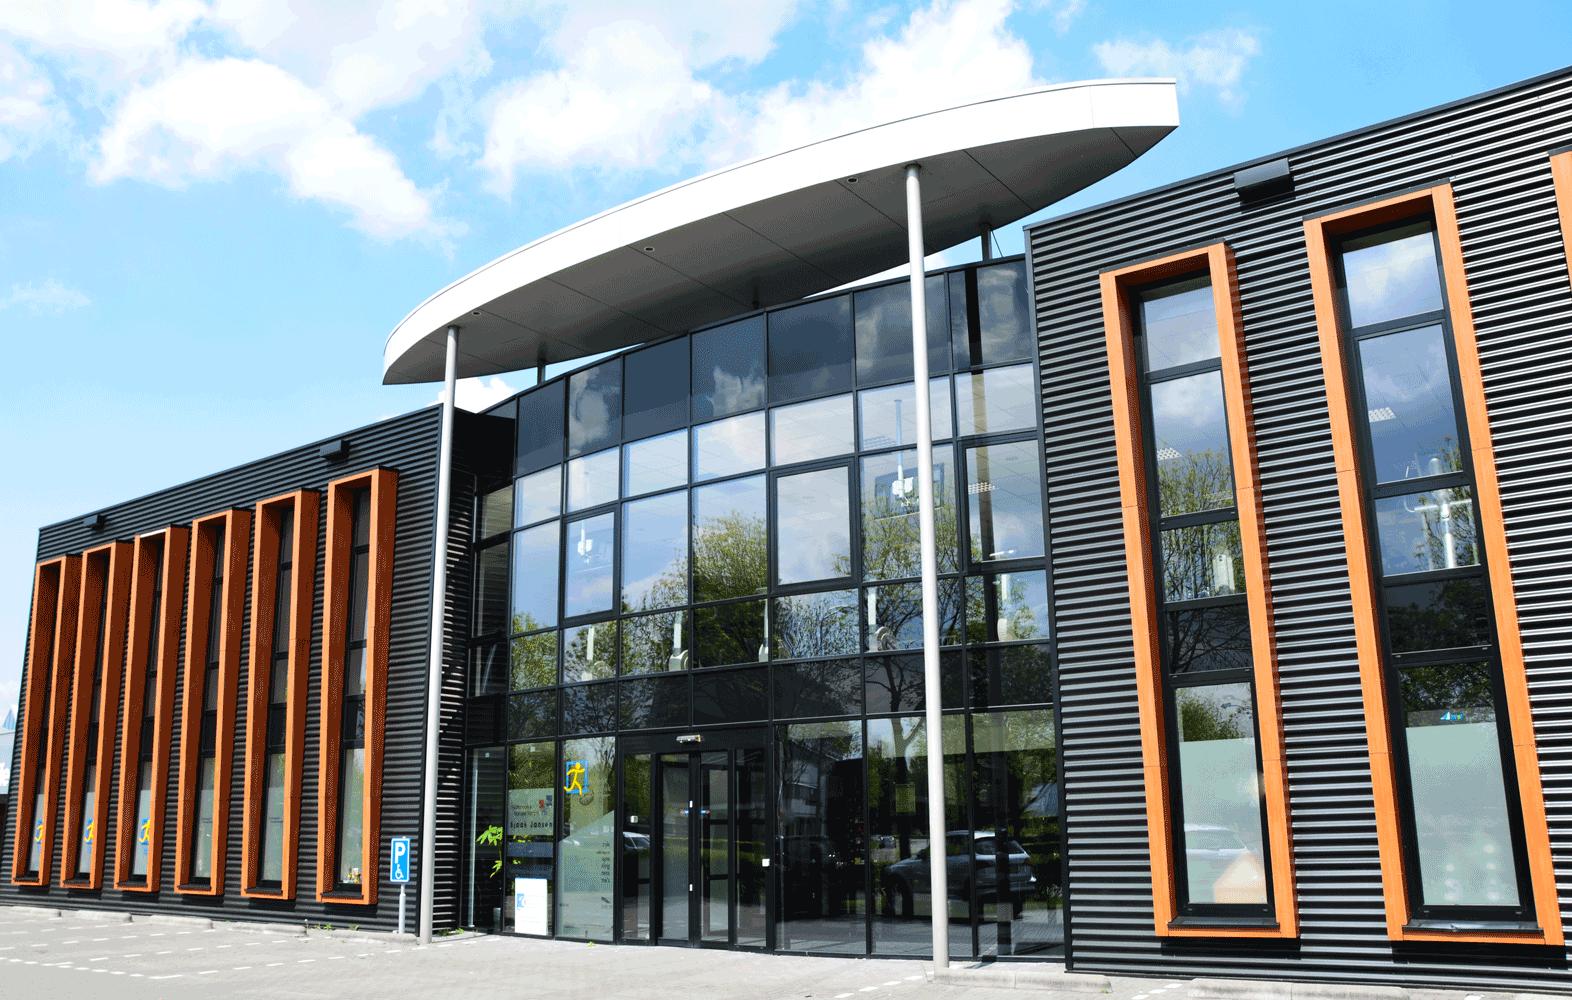 Doetinchem Sportpalace